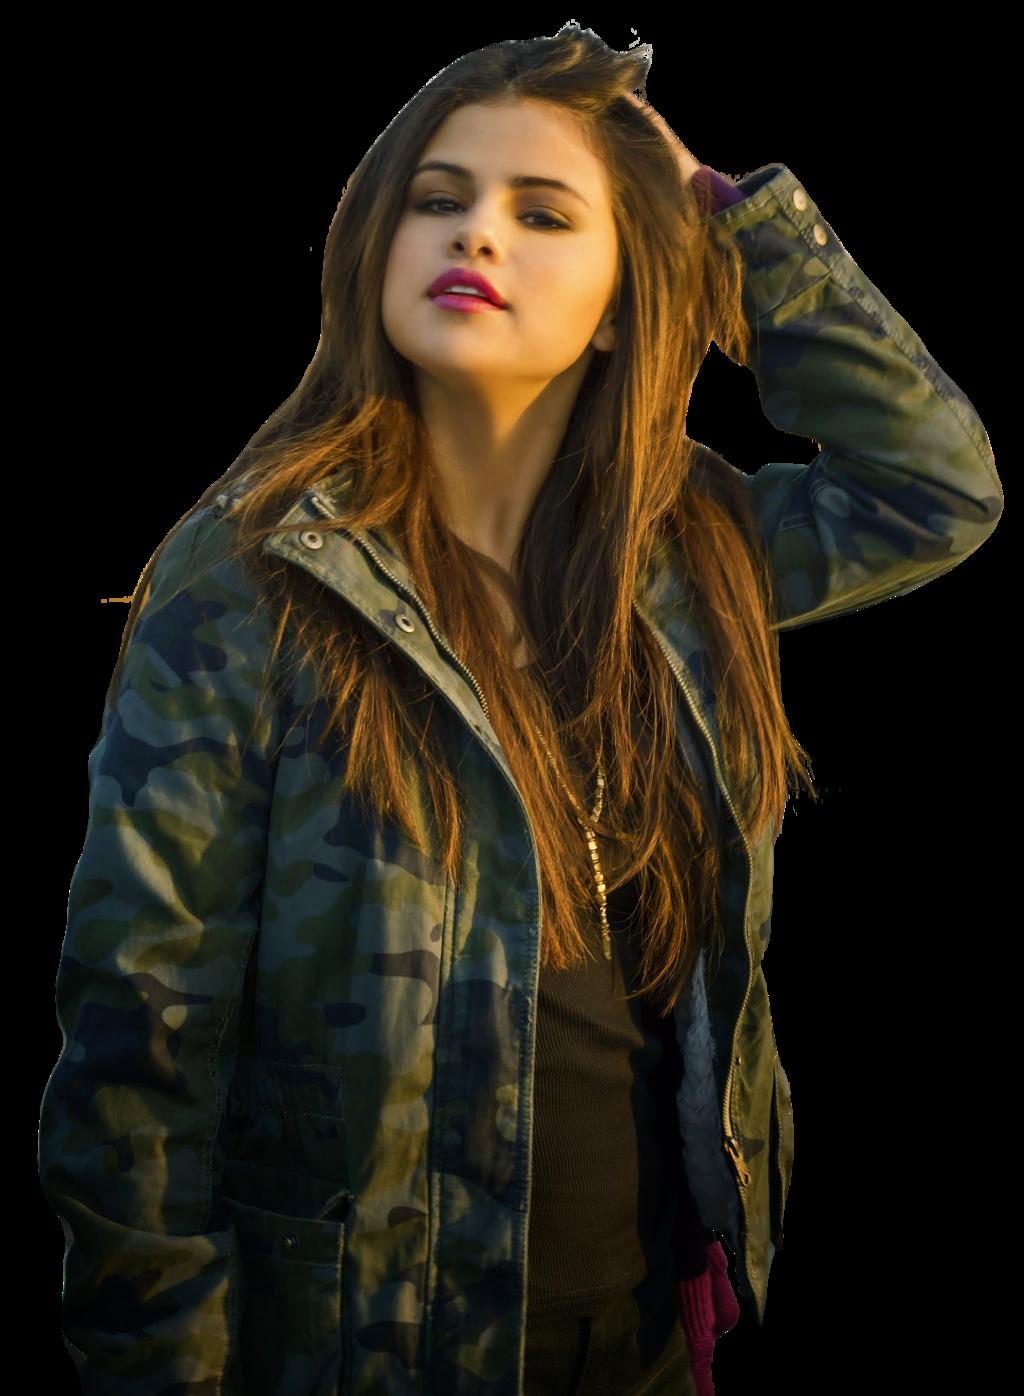 Selena Gomez Png By Maarcopngs Selena Gomez Png By Maarcopngs - Selena Gomez, Transparent background PNG HD thumbnail